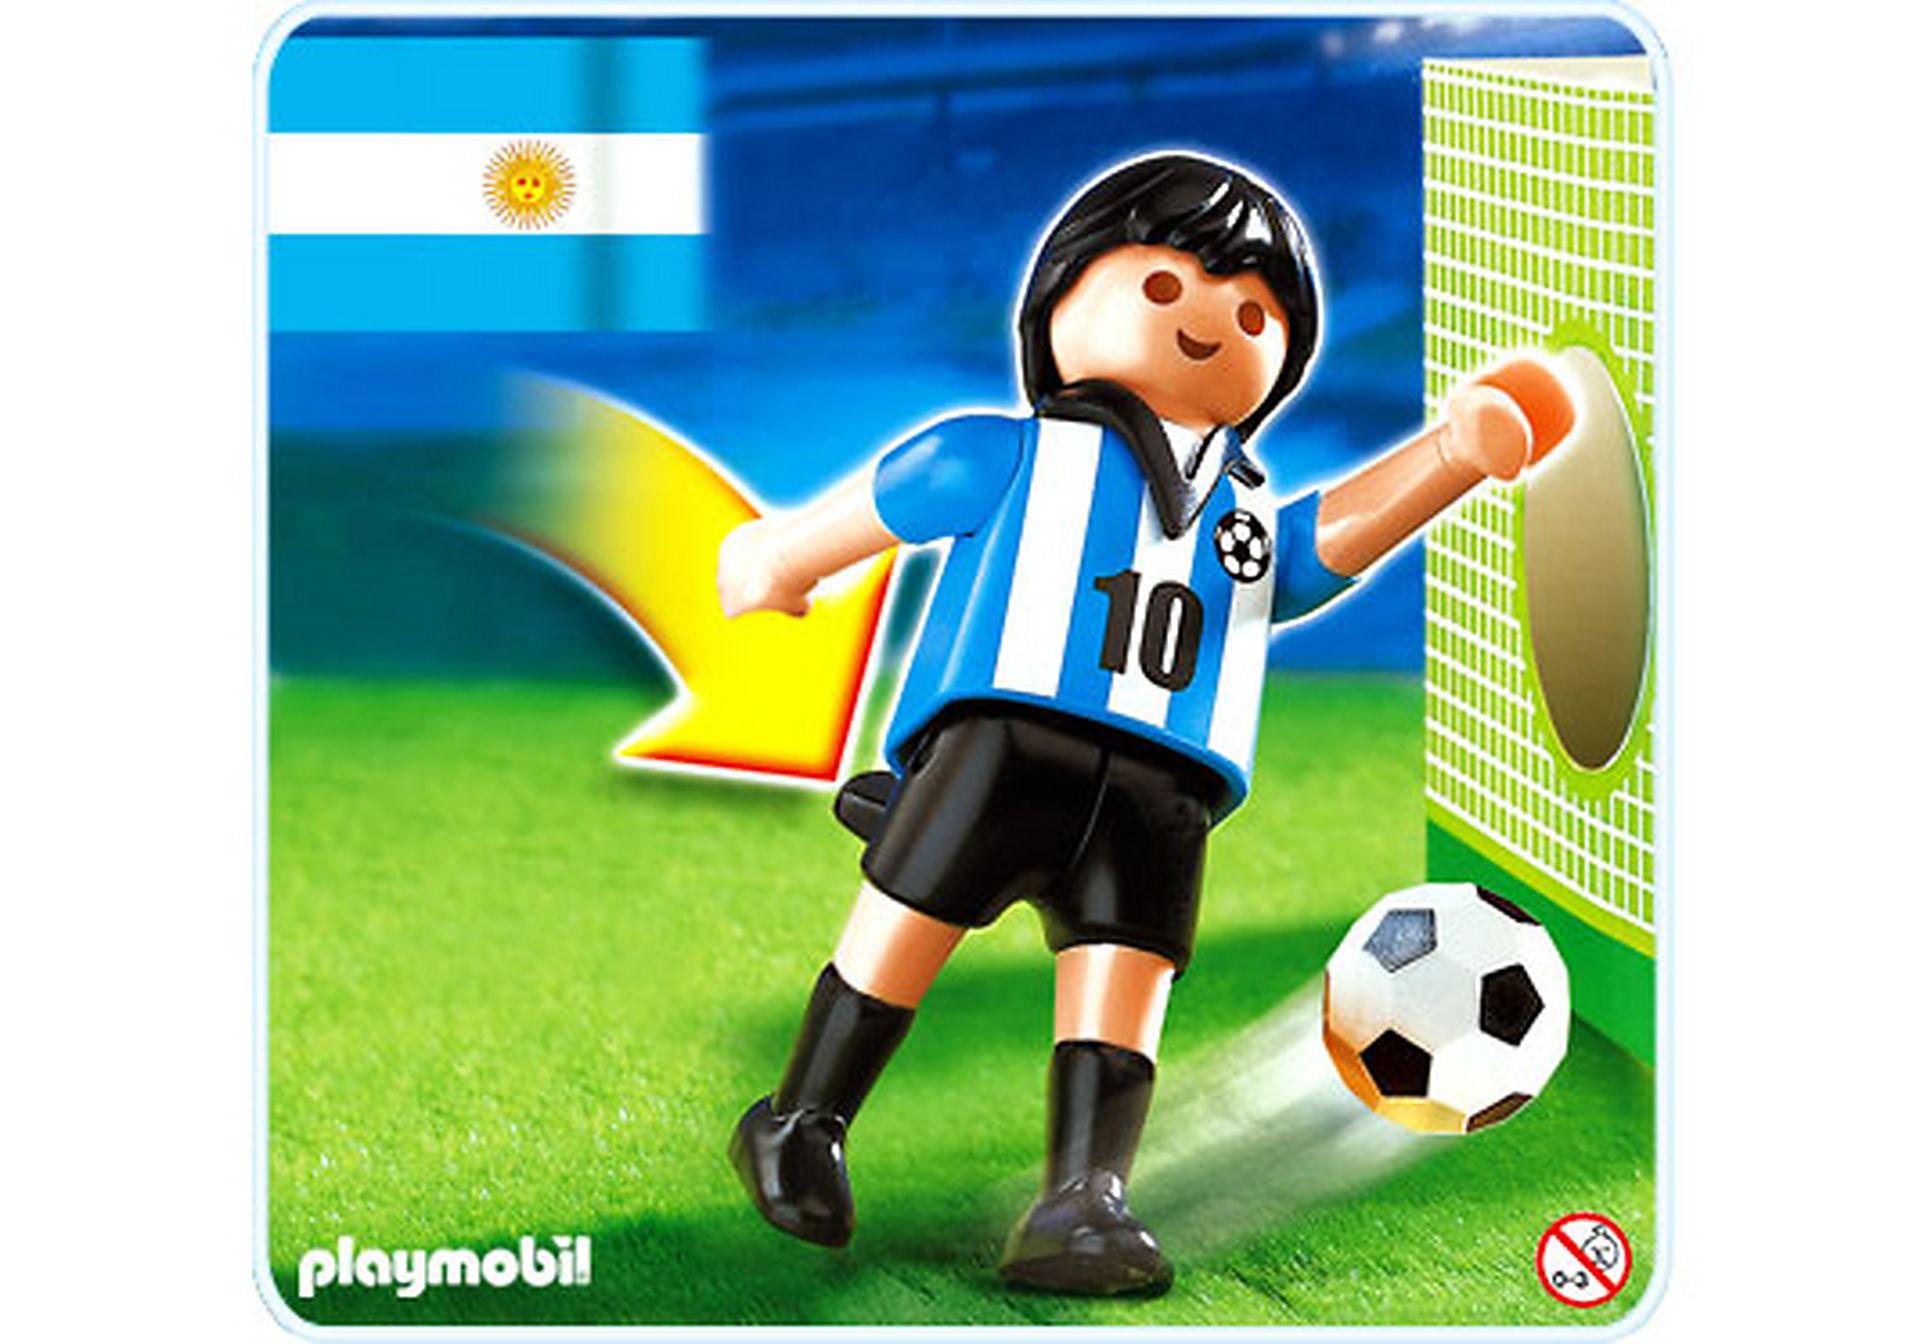 http://media.playmobil.com/i/playmobil/4705-A_product_detail/Fußballspieler Argentinien